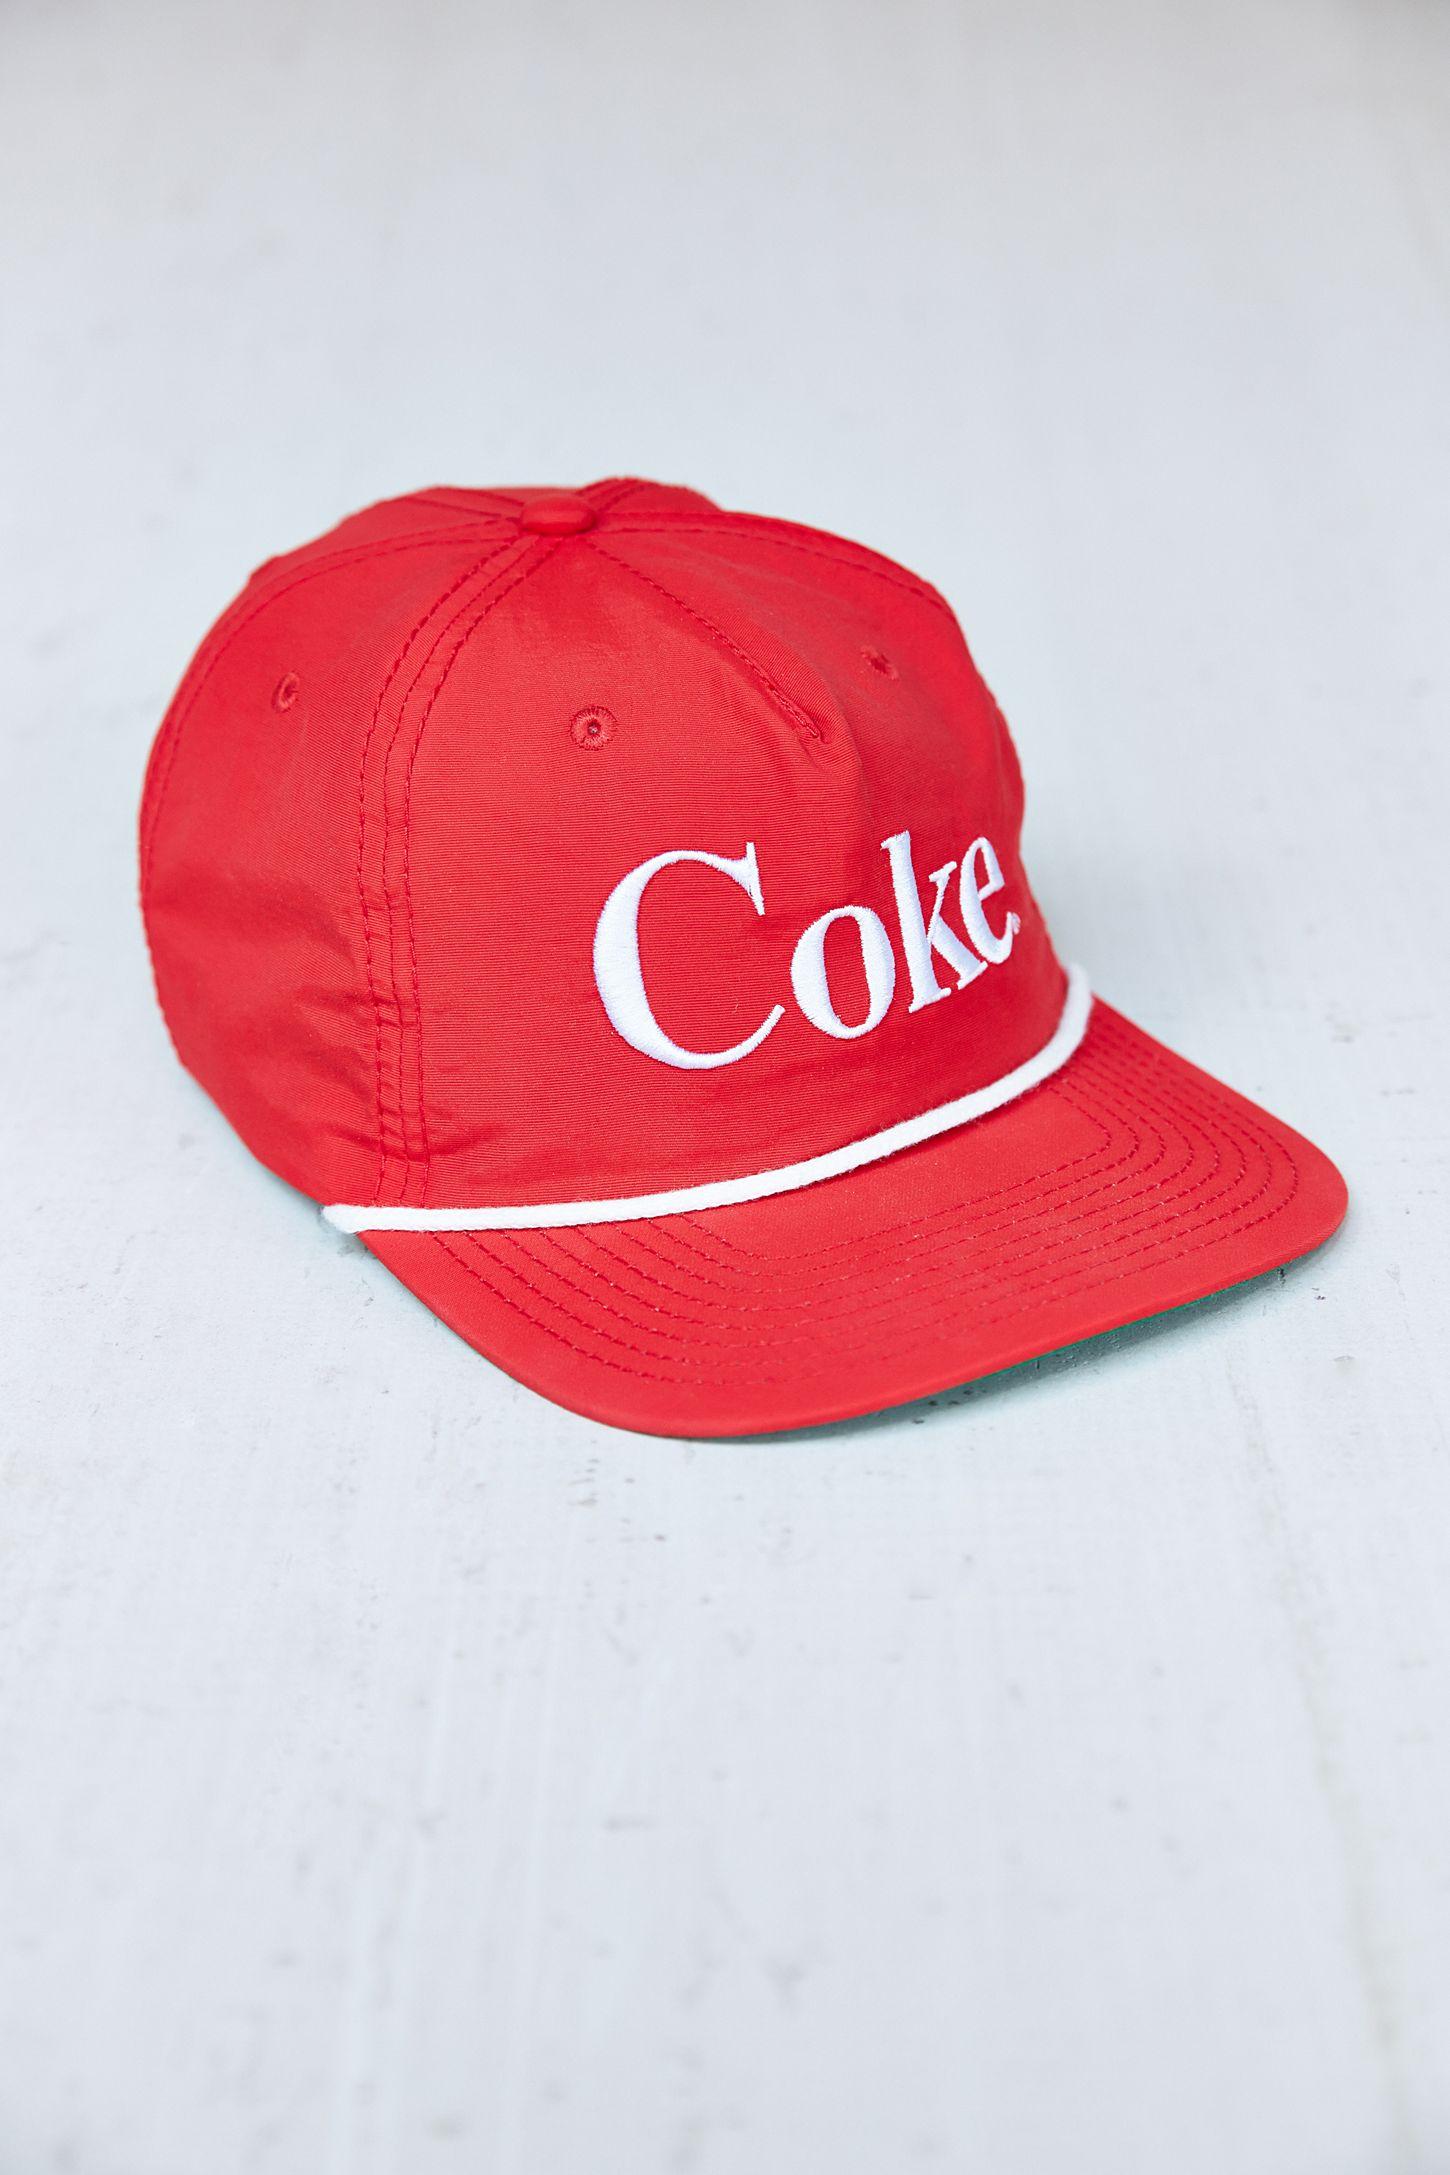 Coke Snapback Hat  703d616cbd6